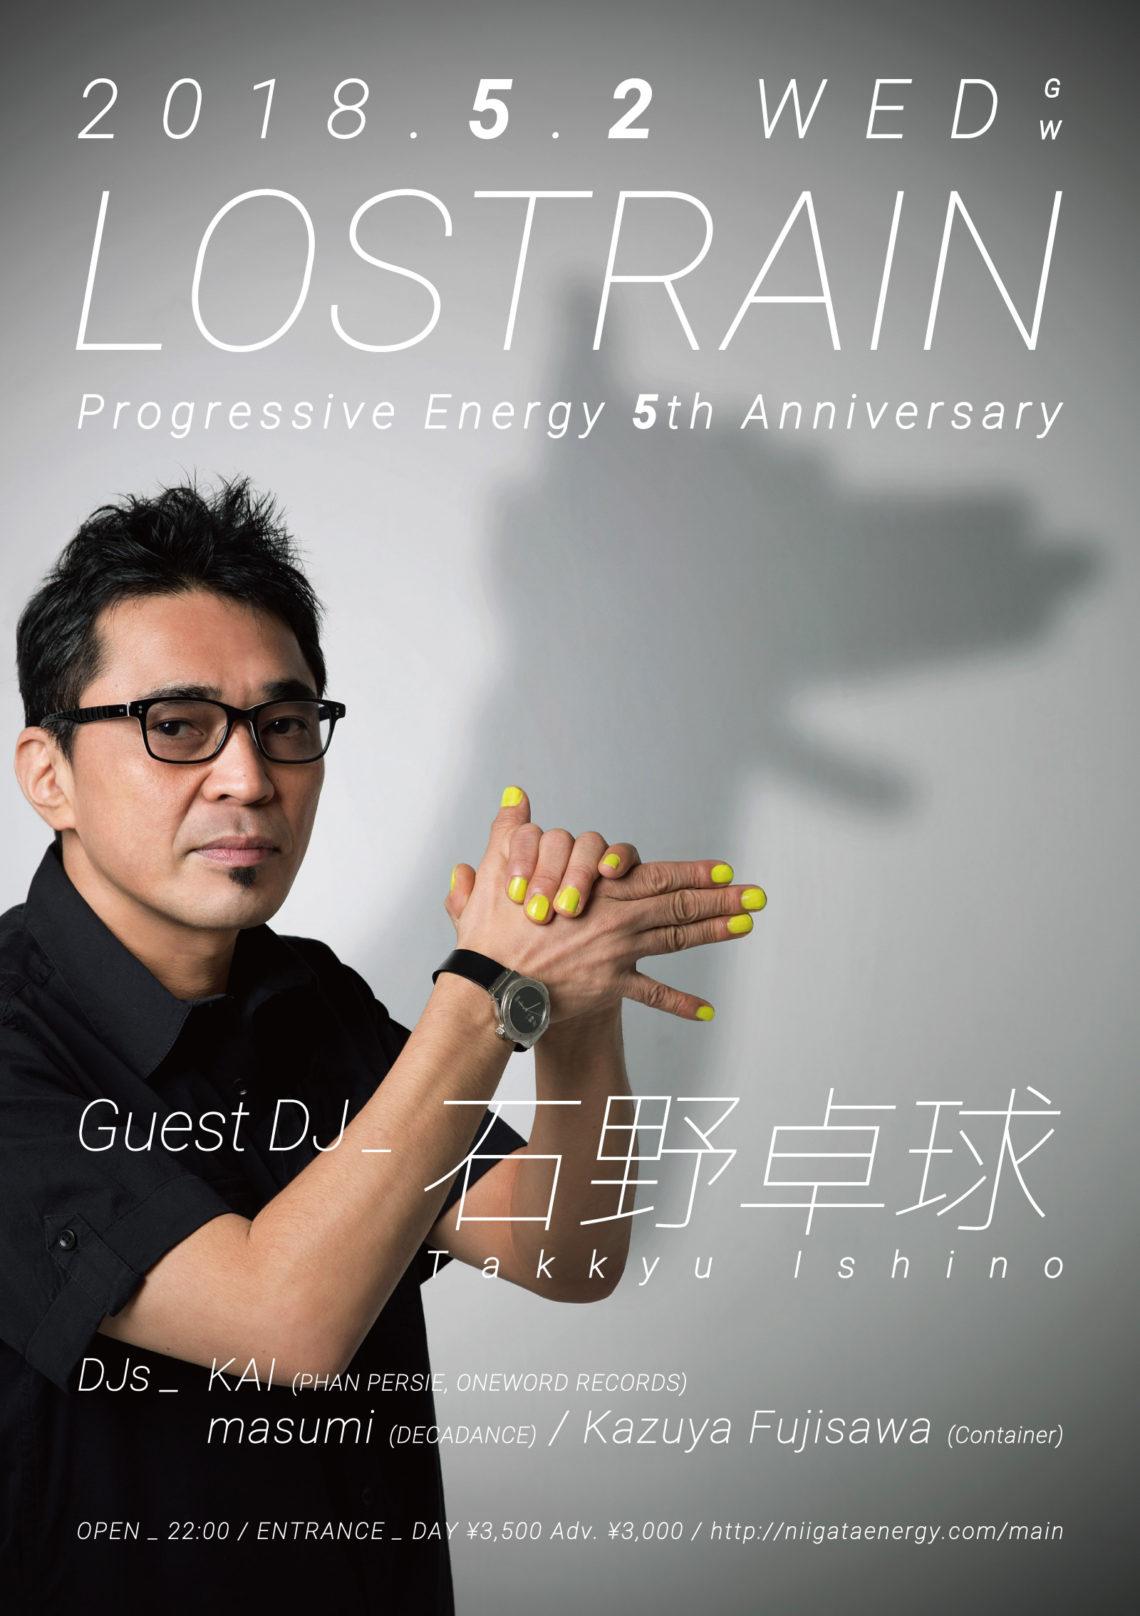 2018.5.2 WED – KAI : DJ@Progressive Energy / LOSTRAIN - Progressive Energy 5th Anniversary